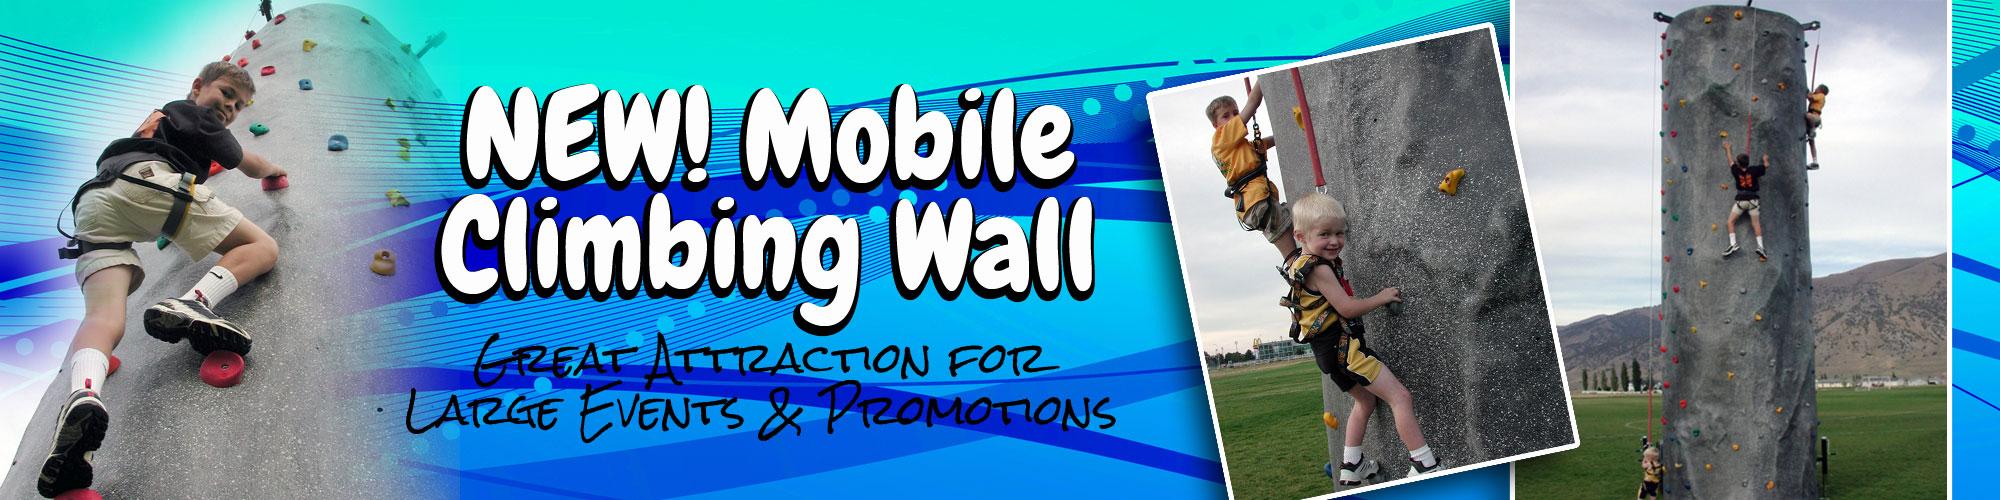 Climbing Wall Rental